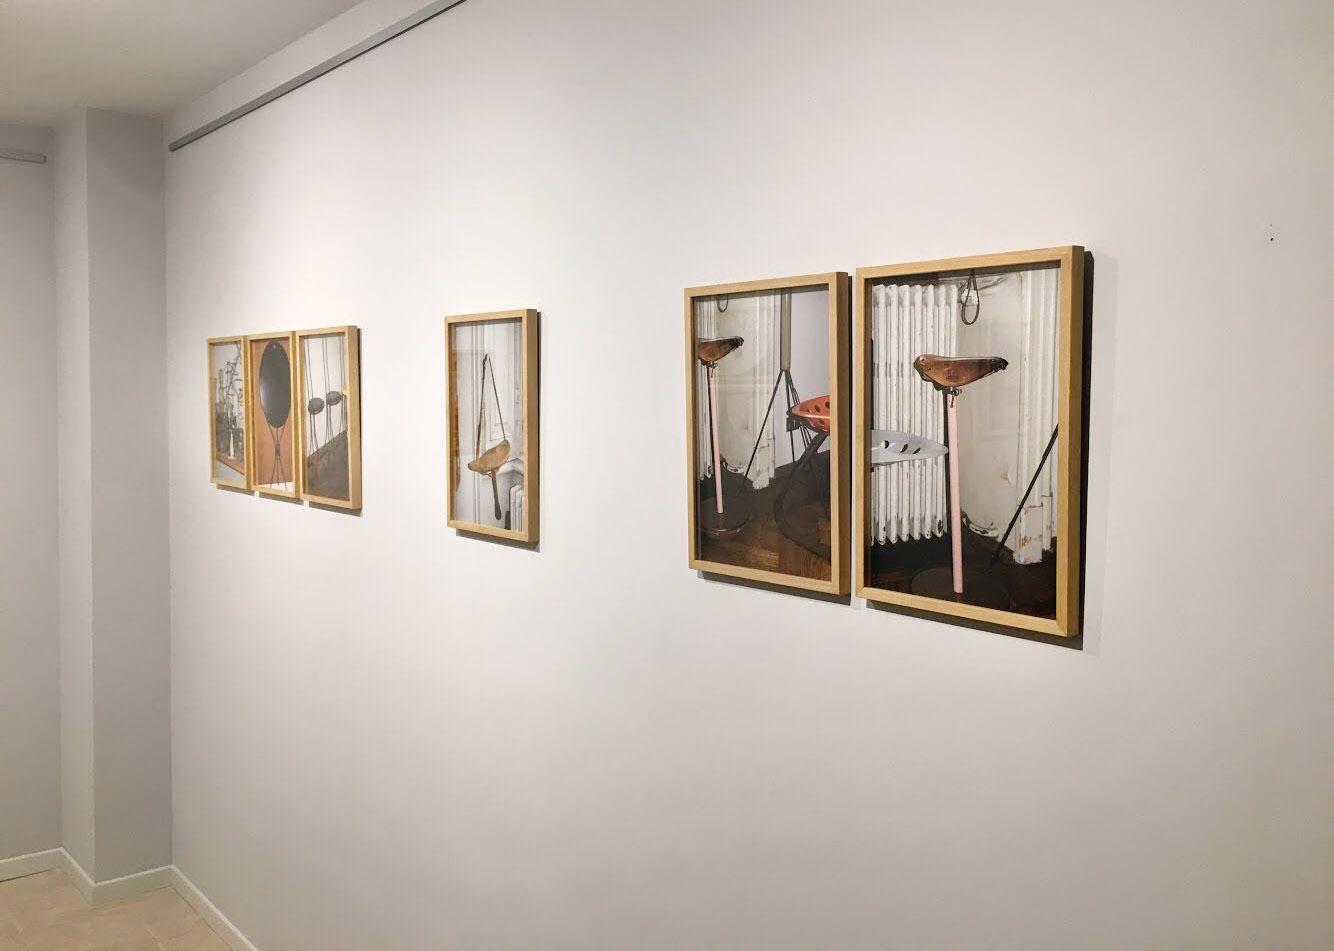 '50/70 Fotografia architettura', Art Gallery37, Torino, 2017